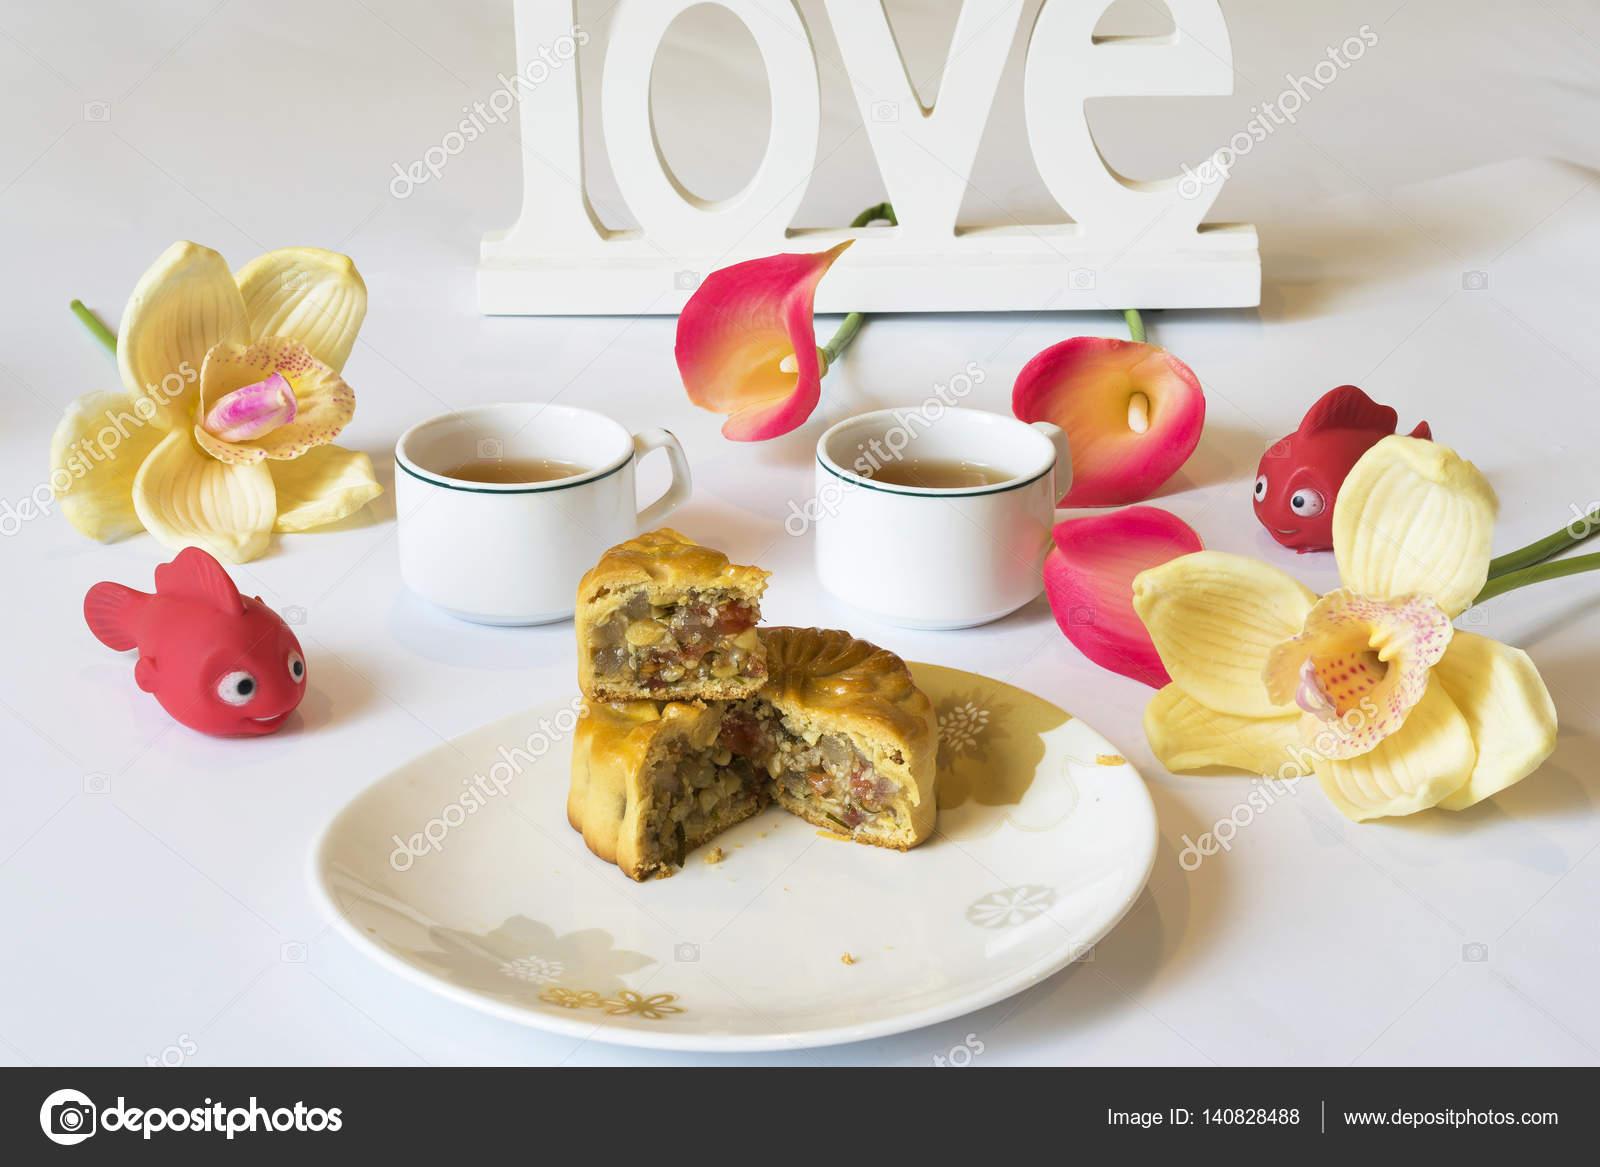 Moon cake, food for Vietnamese mid autumn festival  Focus on